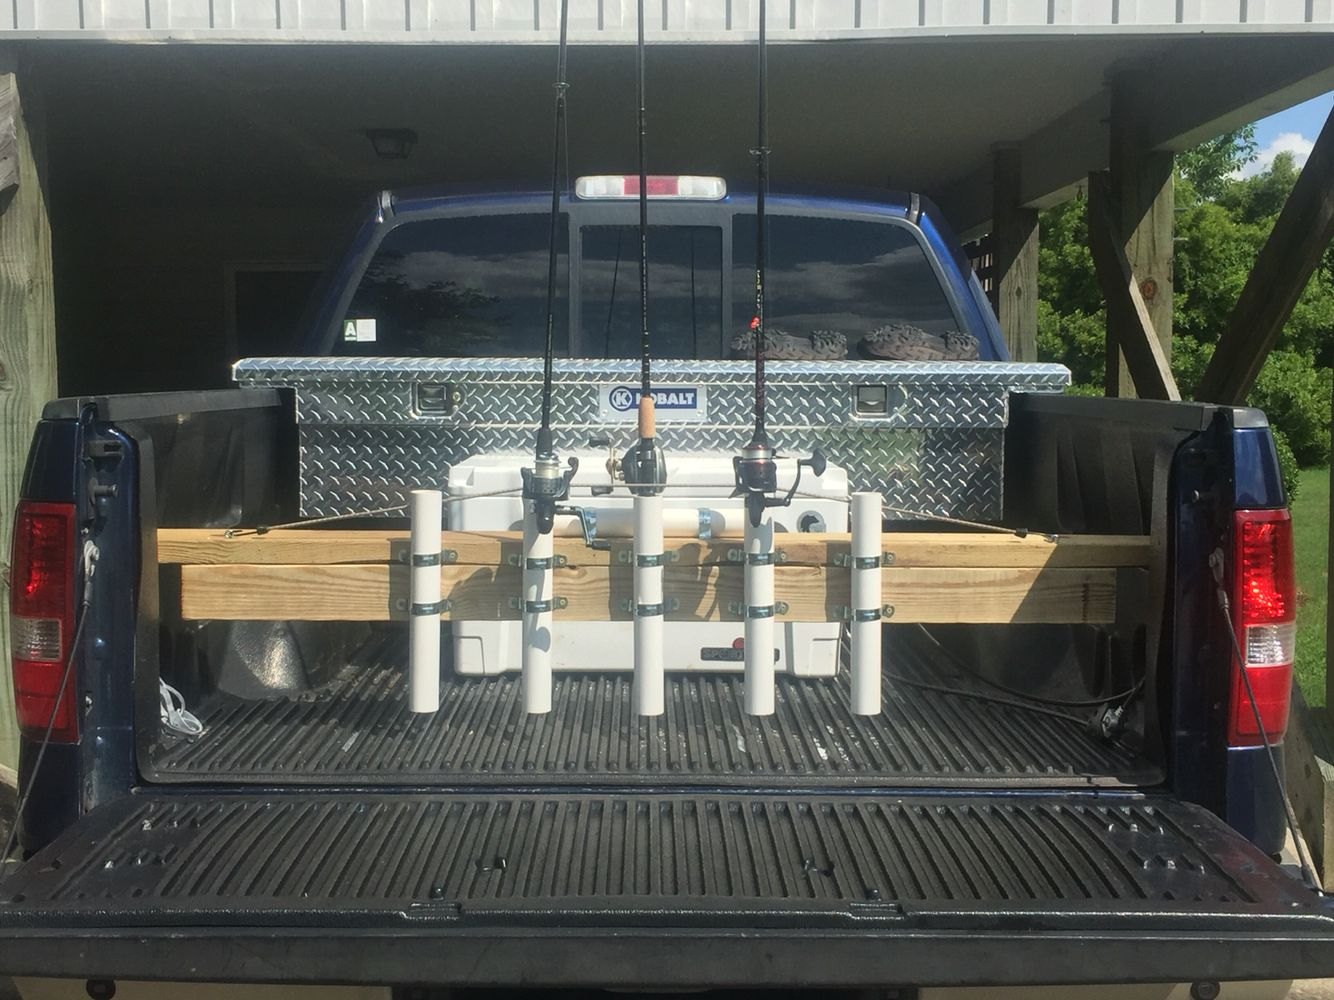 Diy truck bed fishing rod rack holder hacks pinterest for Fishing rod holder for truck